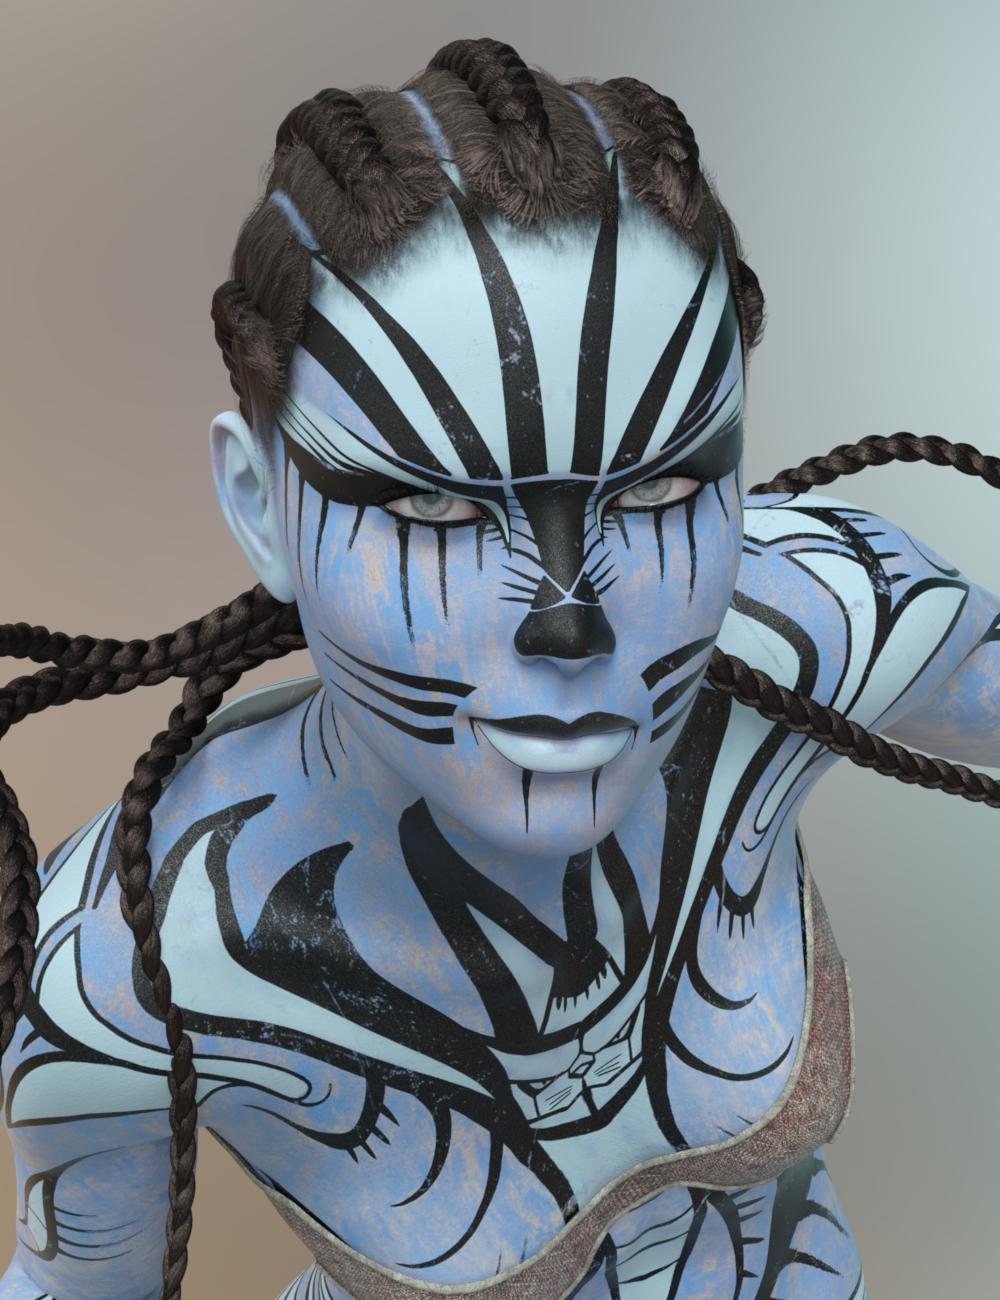 Rhiain for Genesis 8 Female by: Dax Avalange , 3D Models by Daz 3D